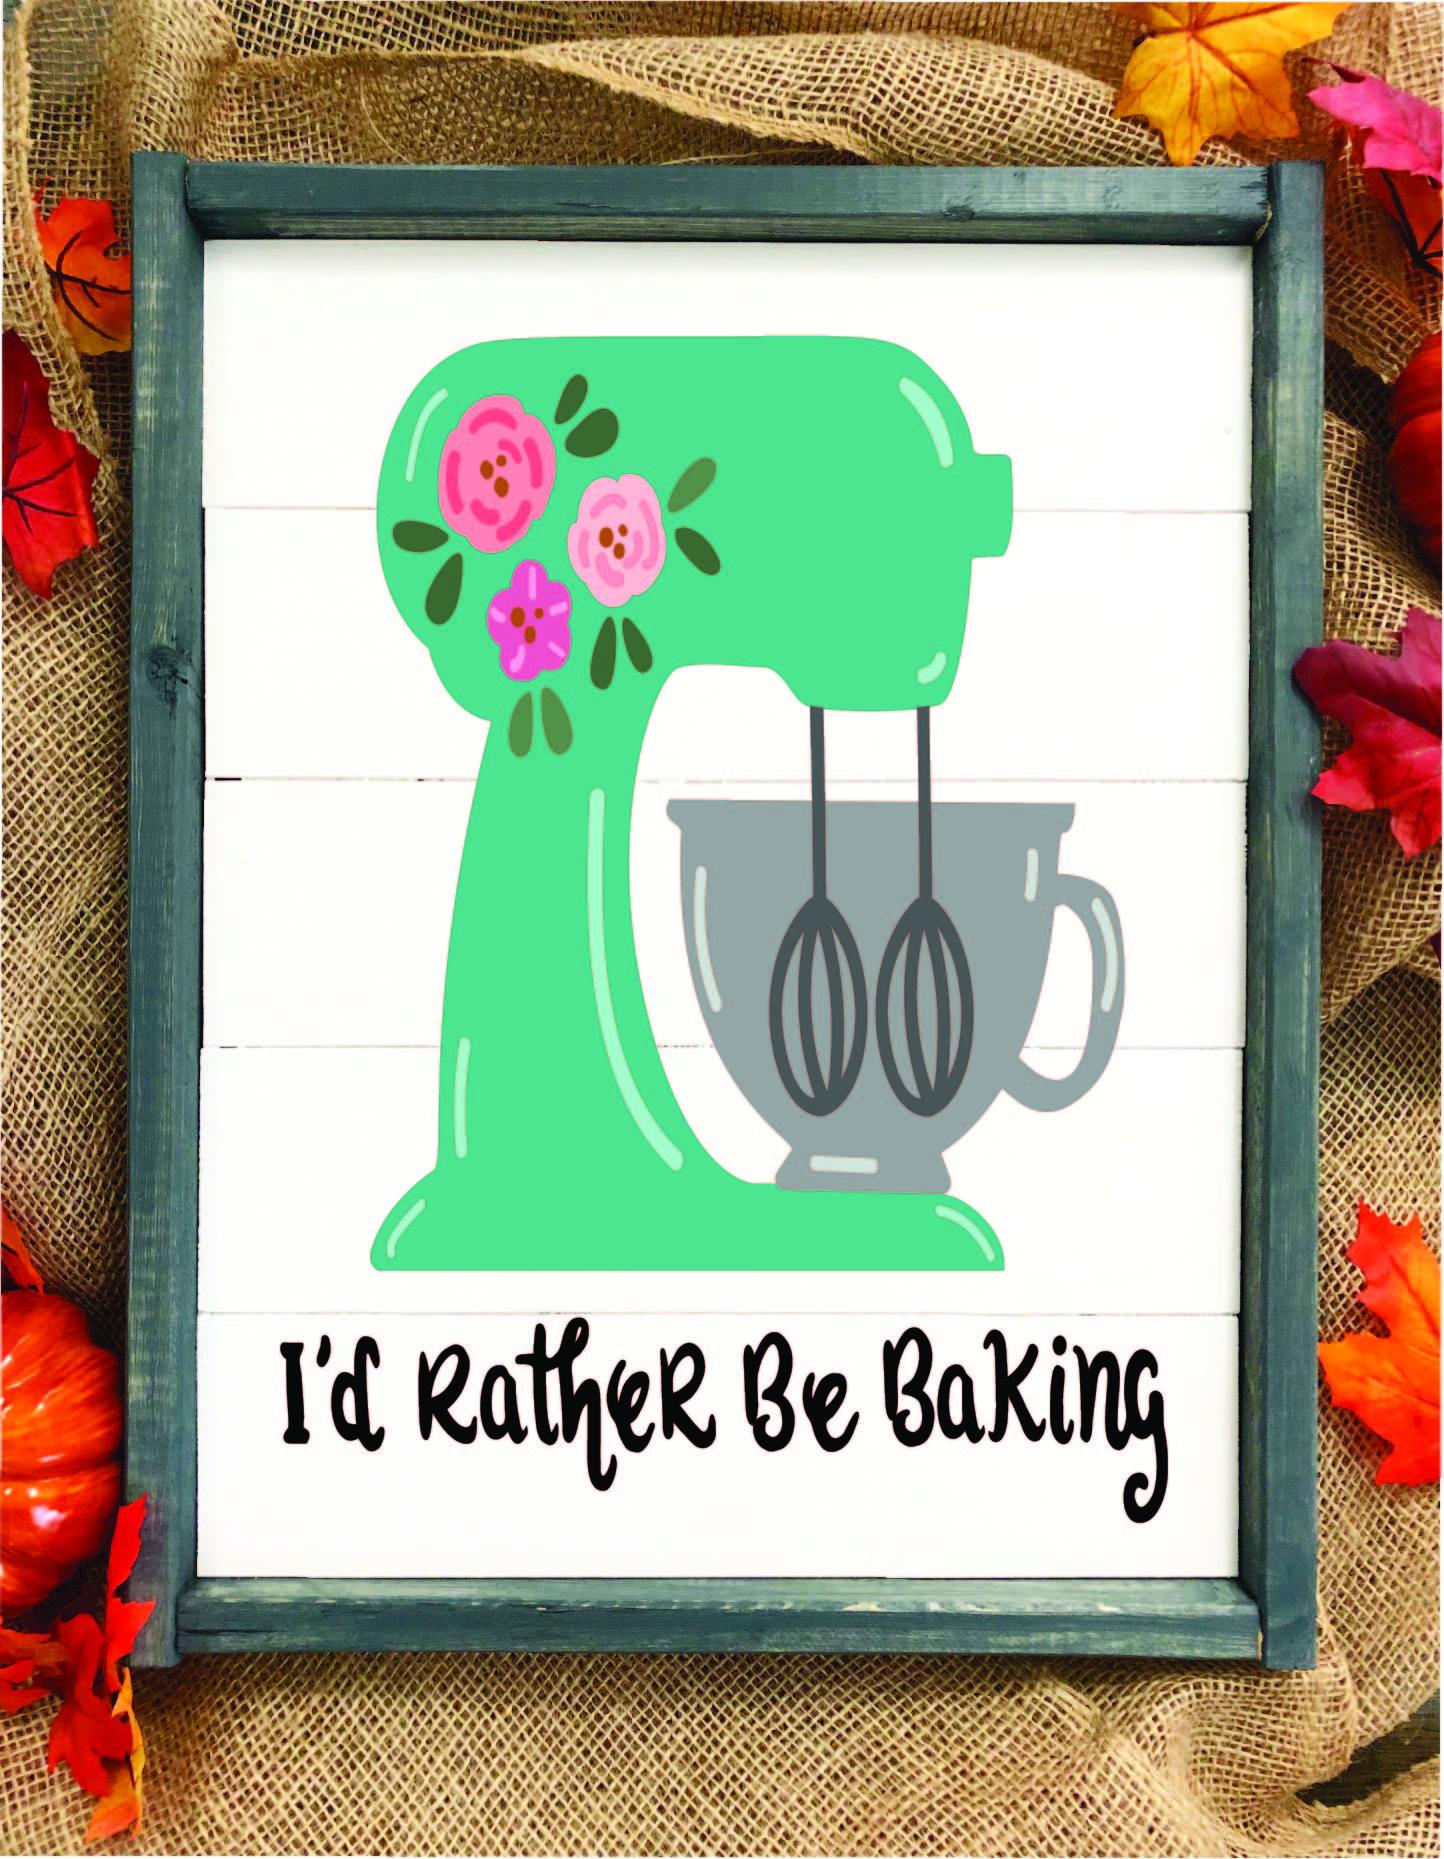 I'd Rather be Baking.jpg